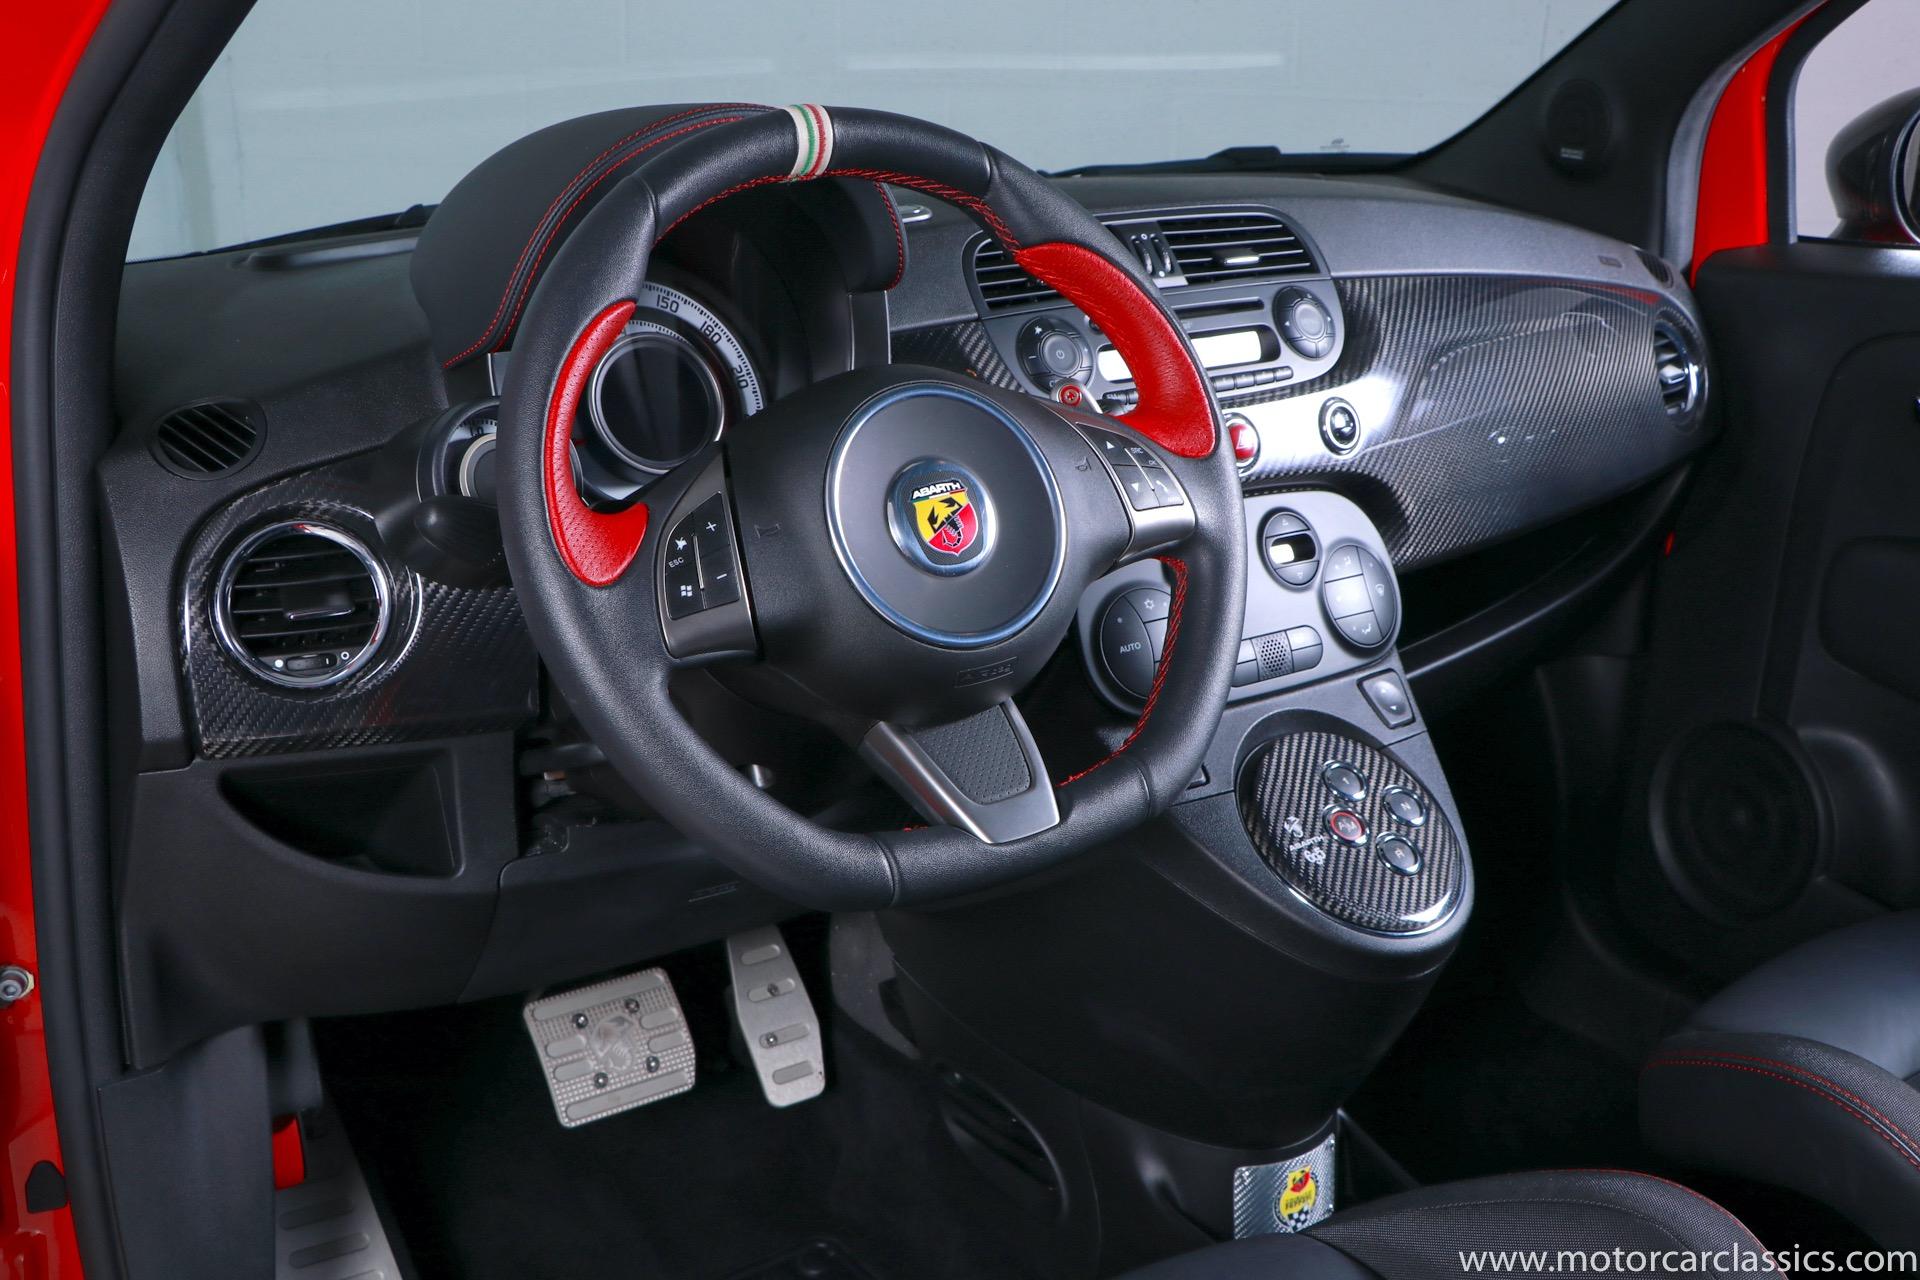 2017 Fiat Abarth 695 Tributo Ferrari